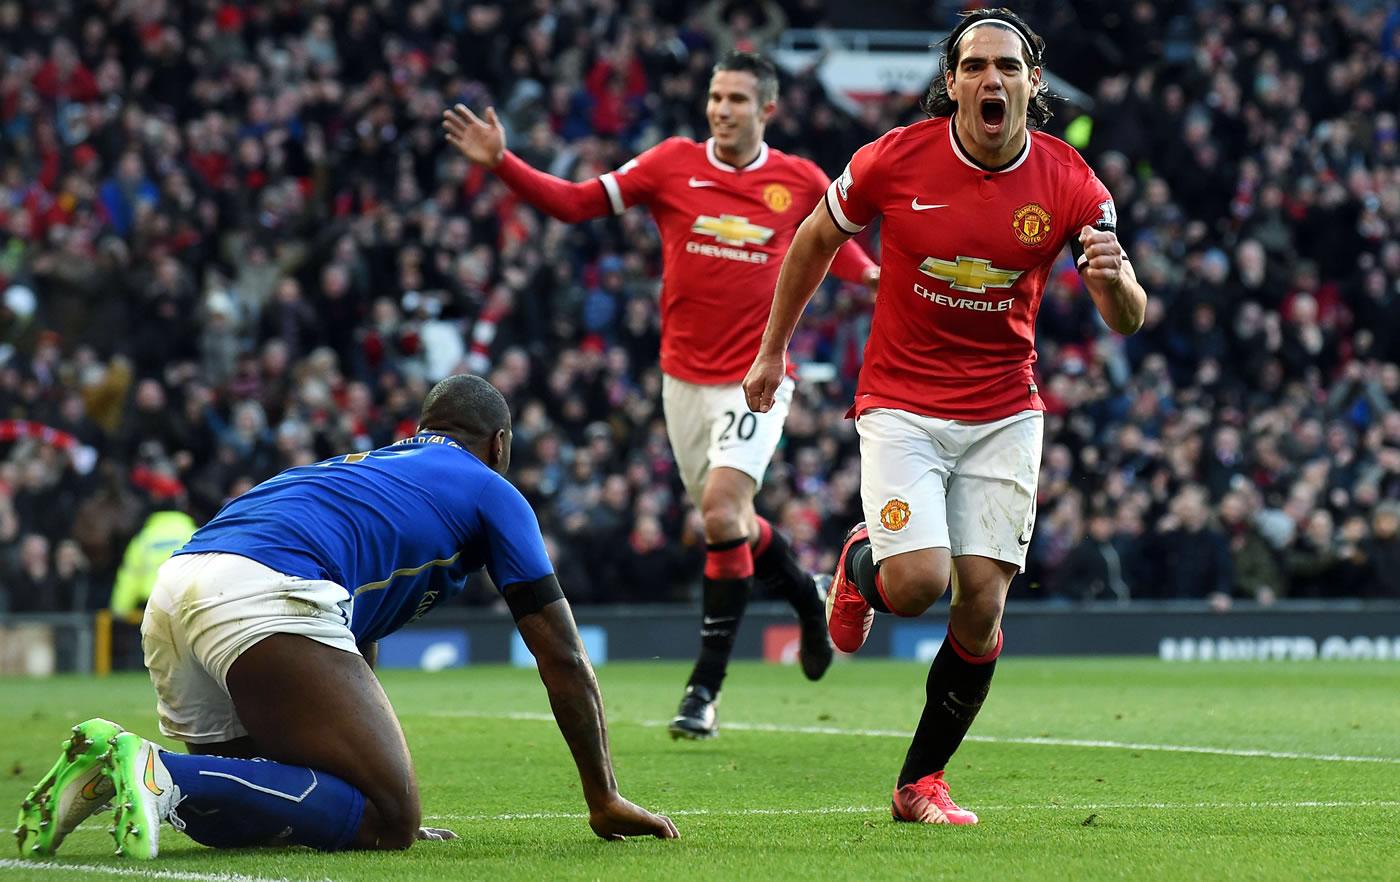 Manchester United 3-1 Leicester City (Premier League)